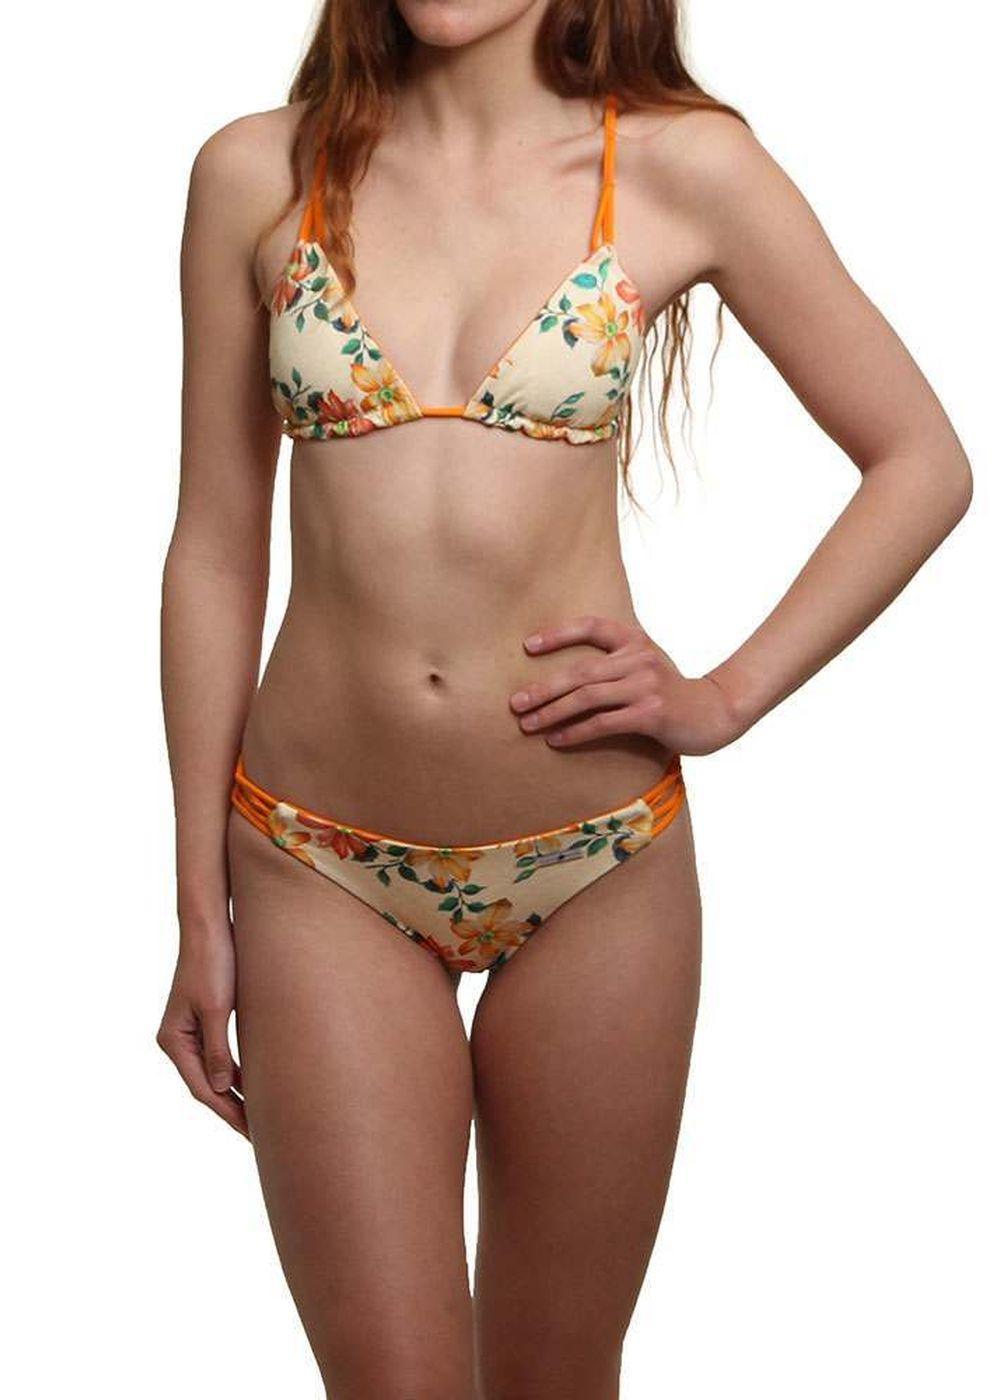 pukas-slide-2-straps-rev-bikini-yellow-flower